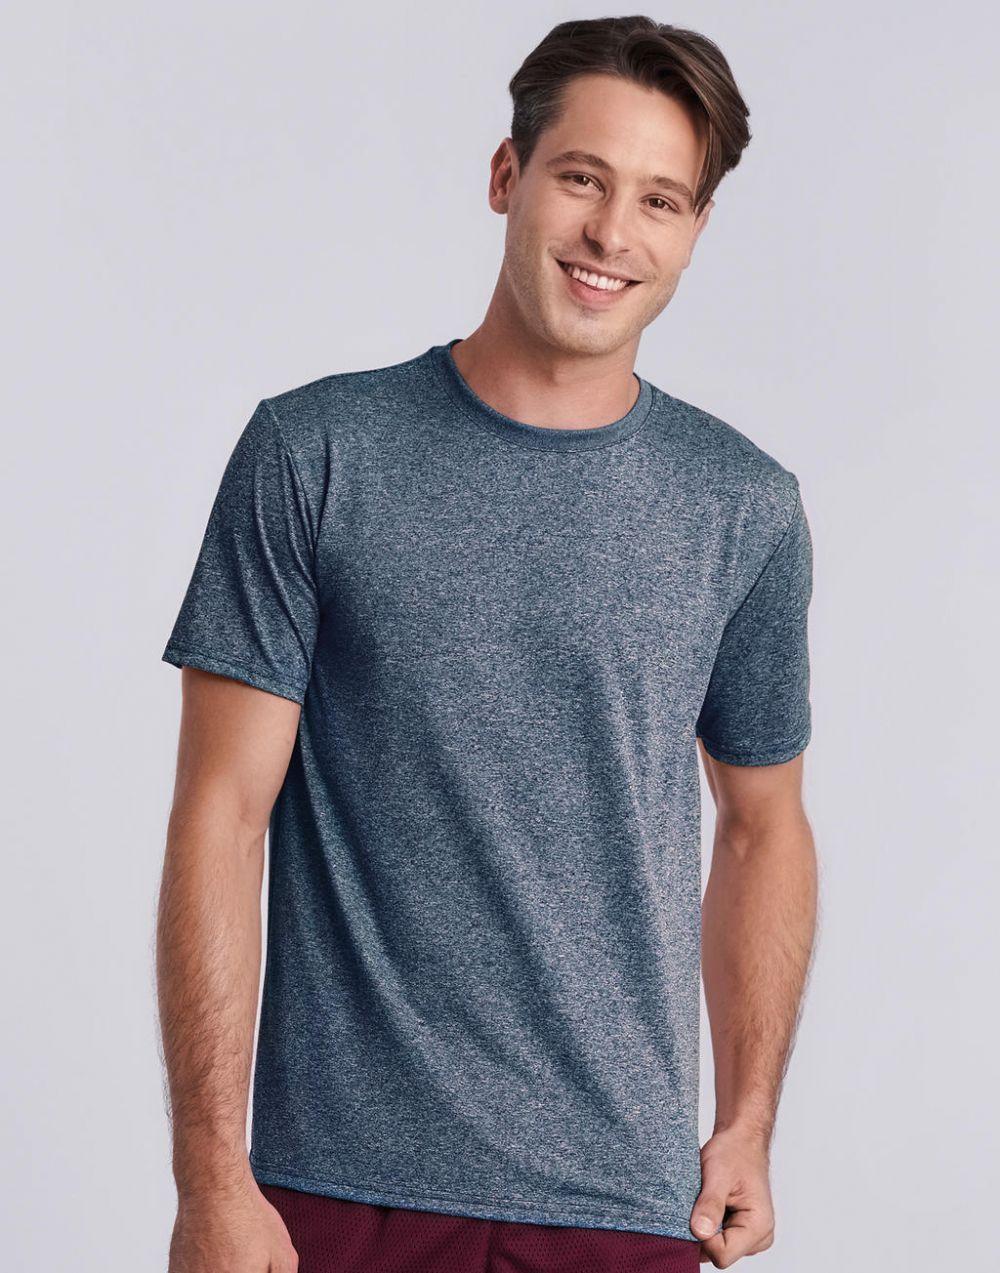 Camisetas técnicas gildan performance core hombre para personalizar vista 1